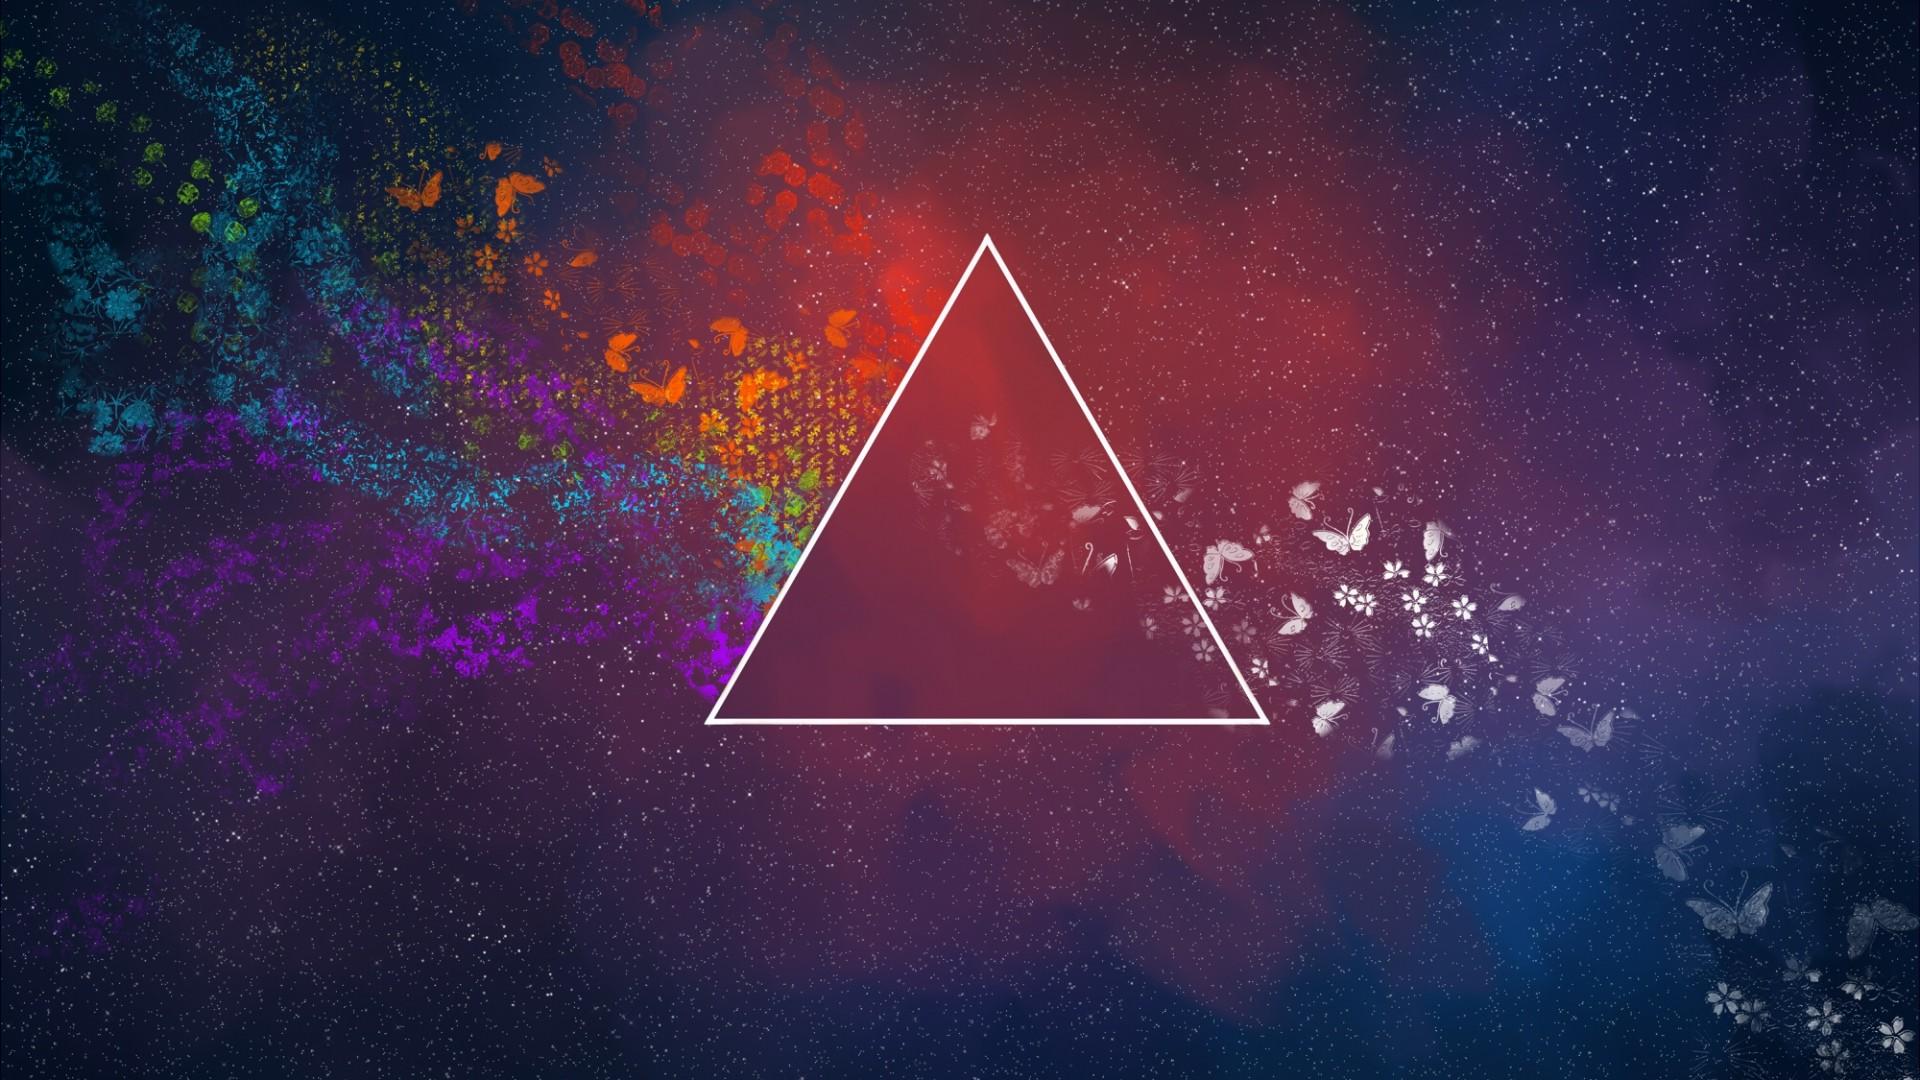 Wallpaper Flowers Night Abstract Galaxy Sky Triangle Nebula